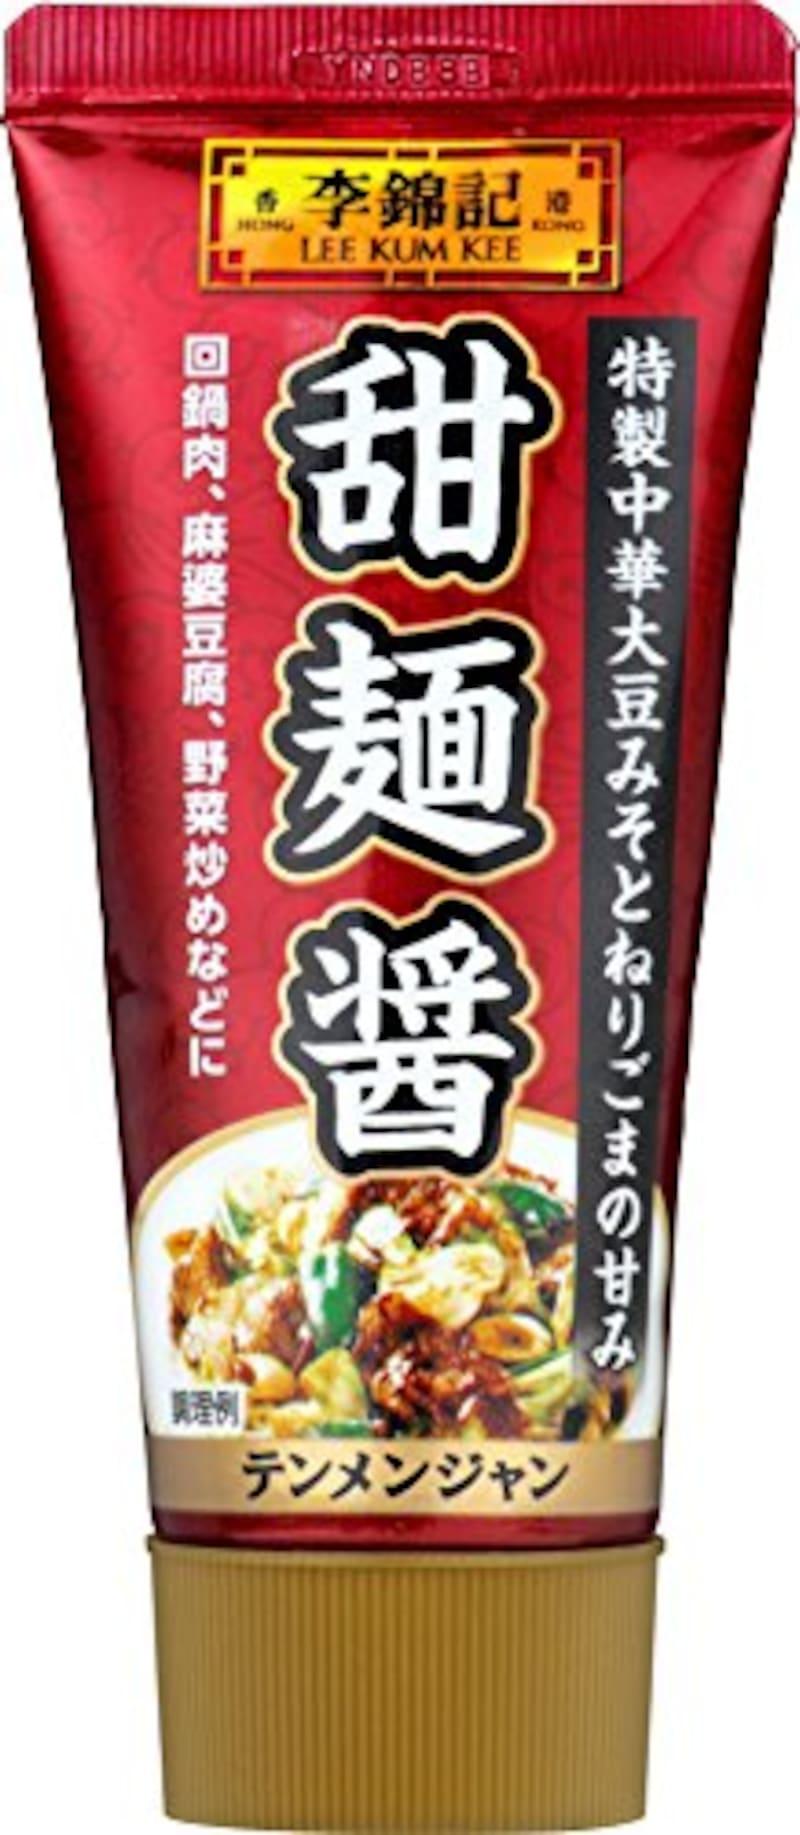 LEE KUM KEE(李錦記),甜麺醤(テンメンジャン),不明